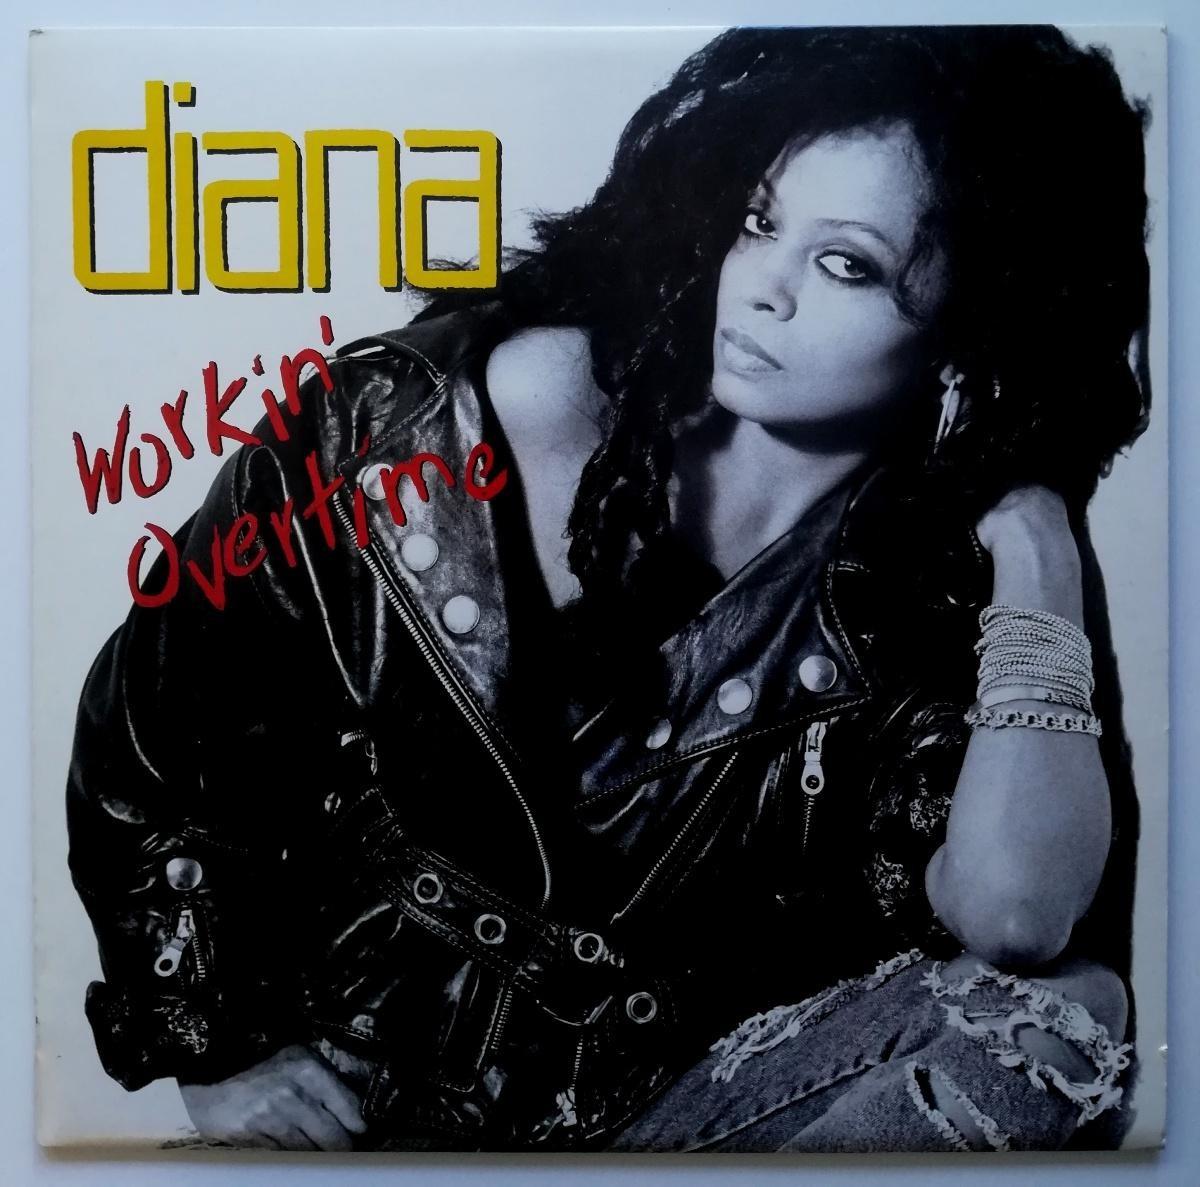 Ross Diana - Workin Overtime